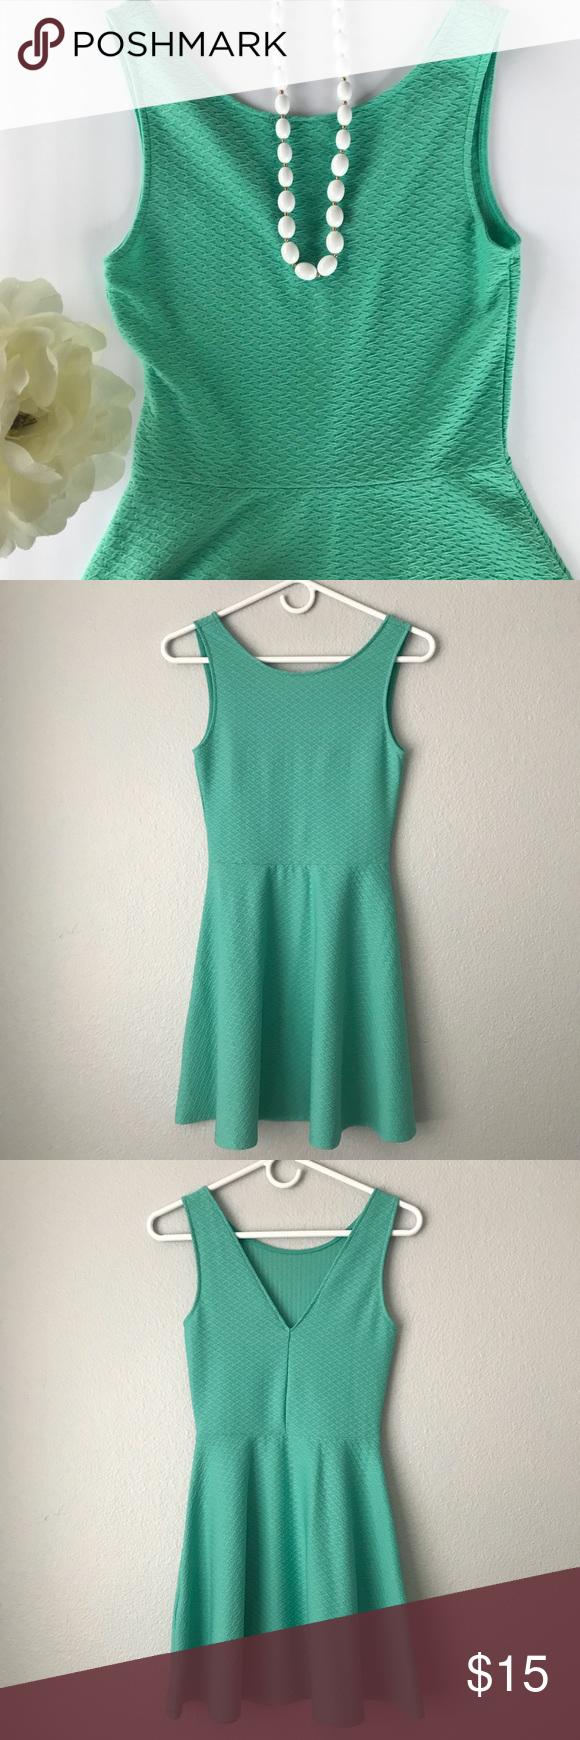 H&m green lace dress  HuM Skater Dress with V back Mint Size   Skater skirt Smoke free